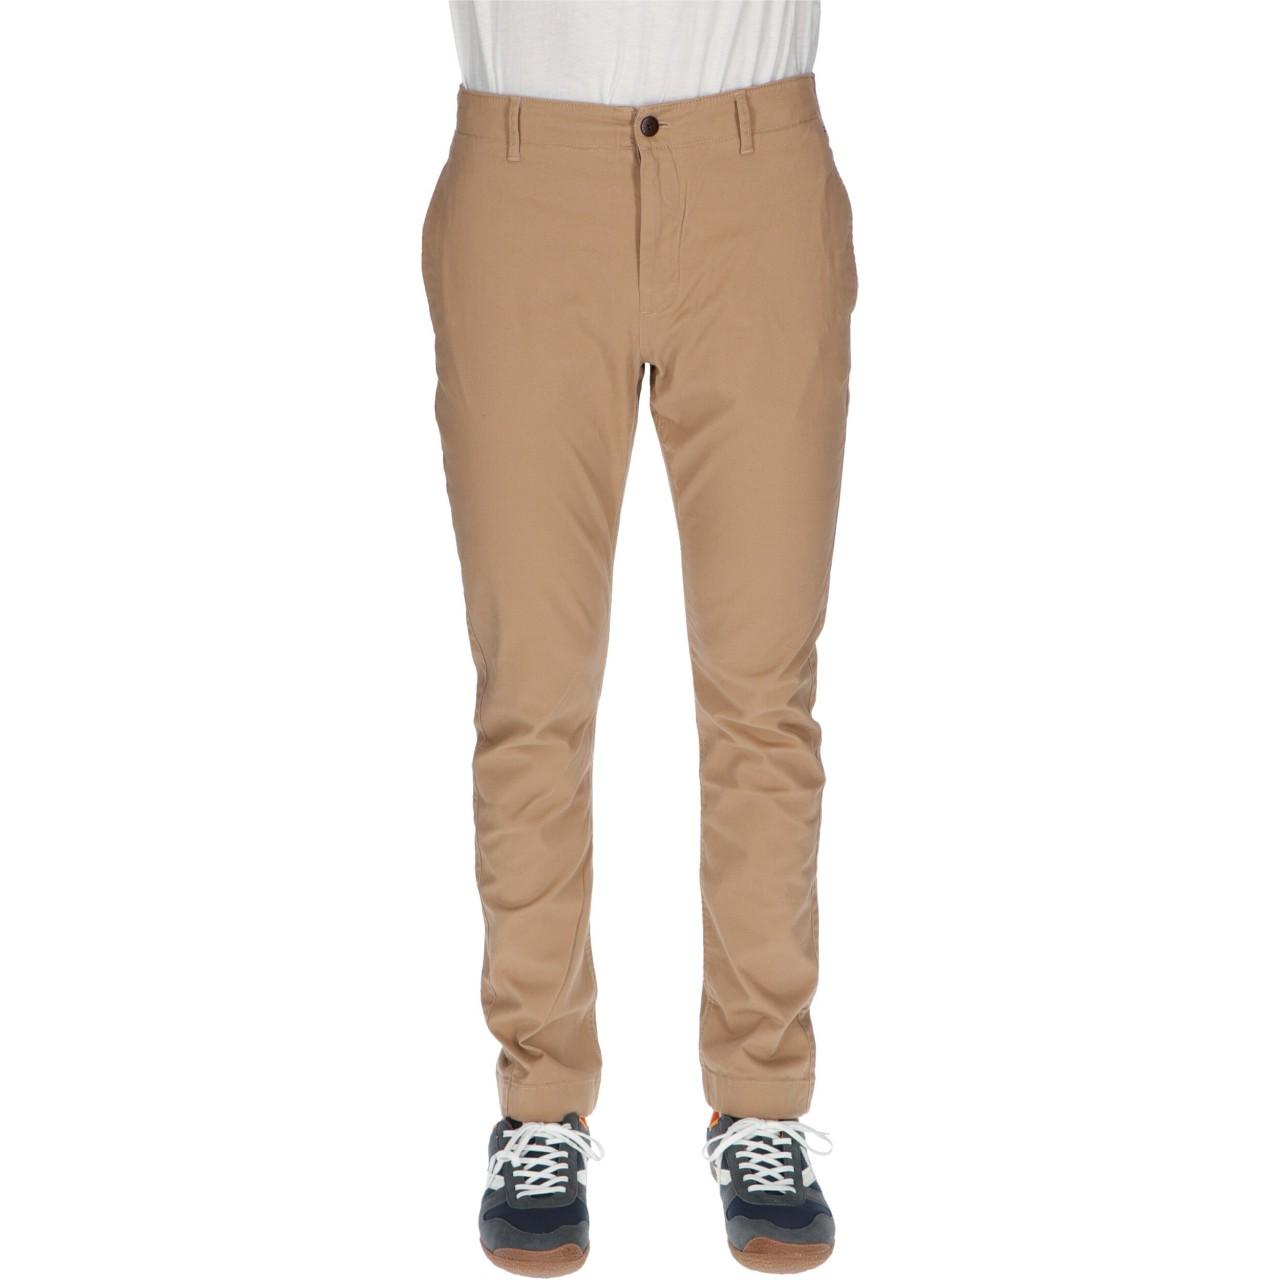 Tommy hilfiger Uomo Pantalone Tommy Hilfiger Uomo Essential Slim Chino 05046L